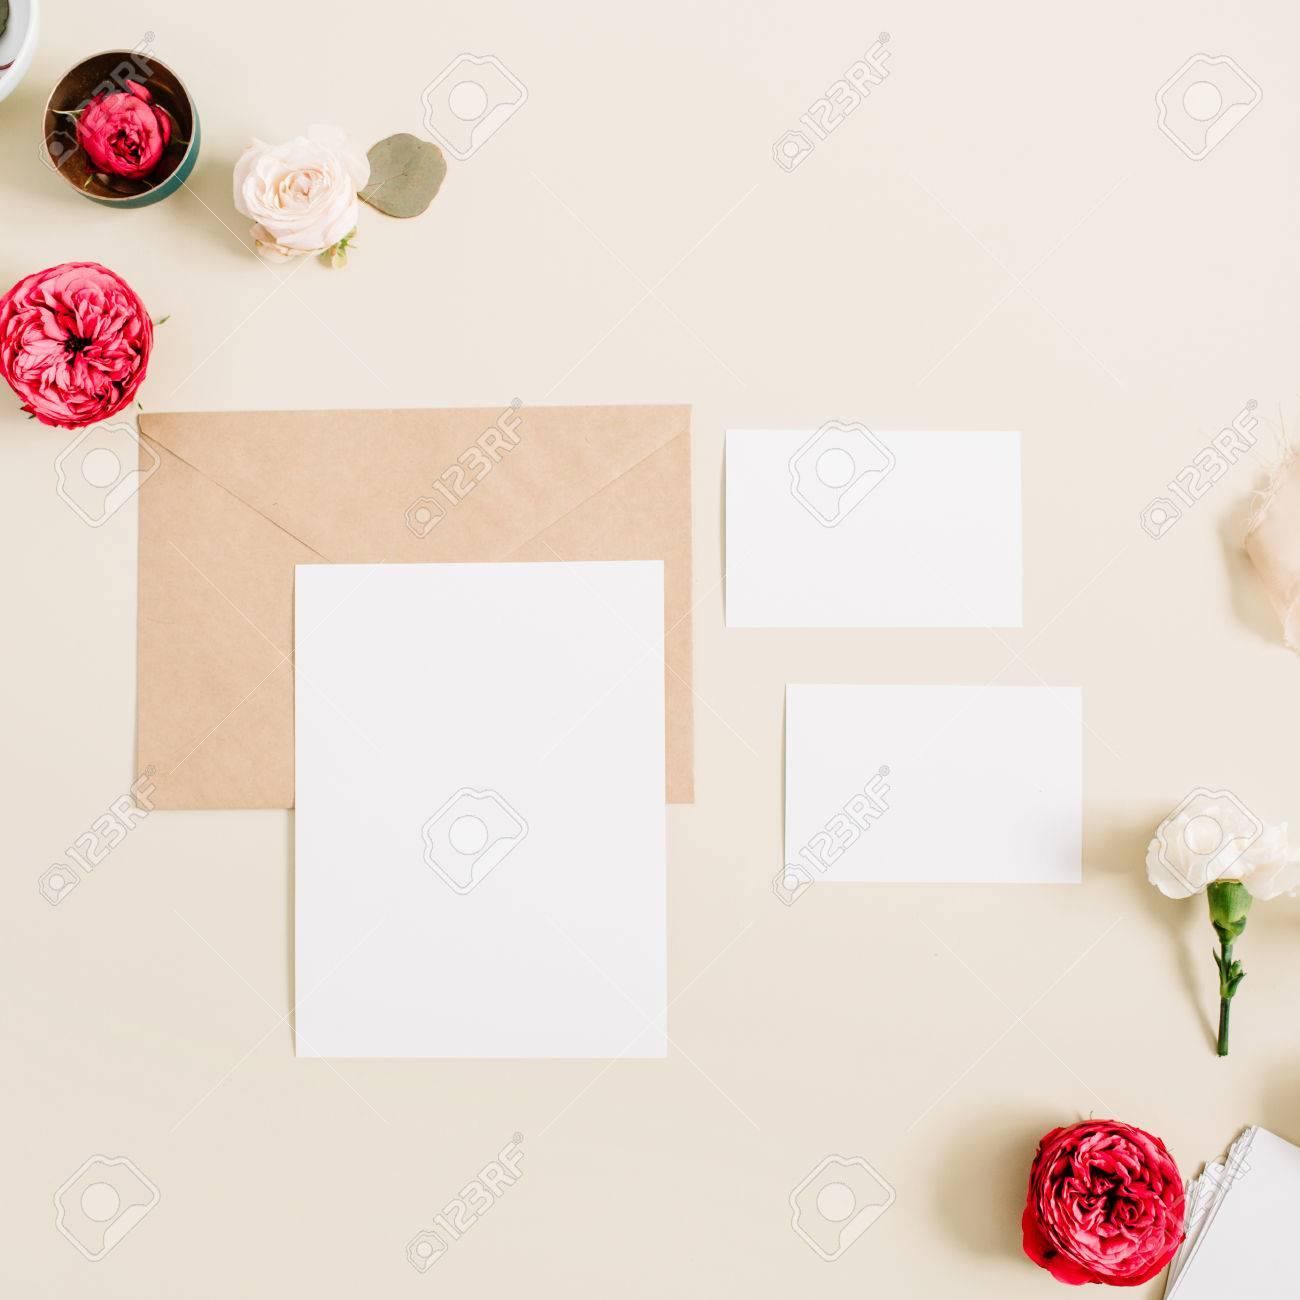 Wedding Invitation Cards Craft Envelope Pink And Red Rose Flower